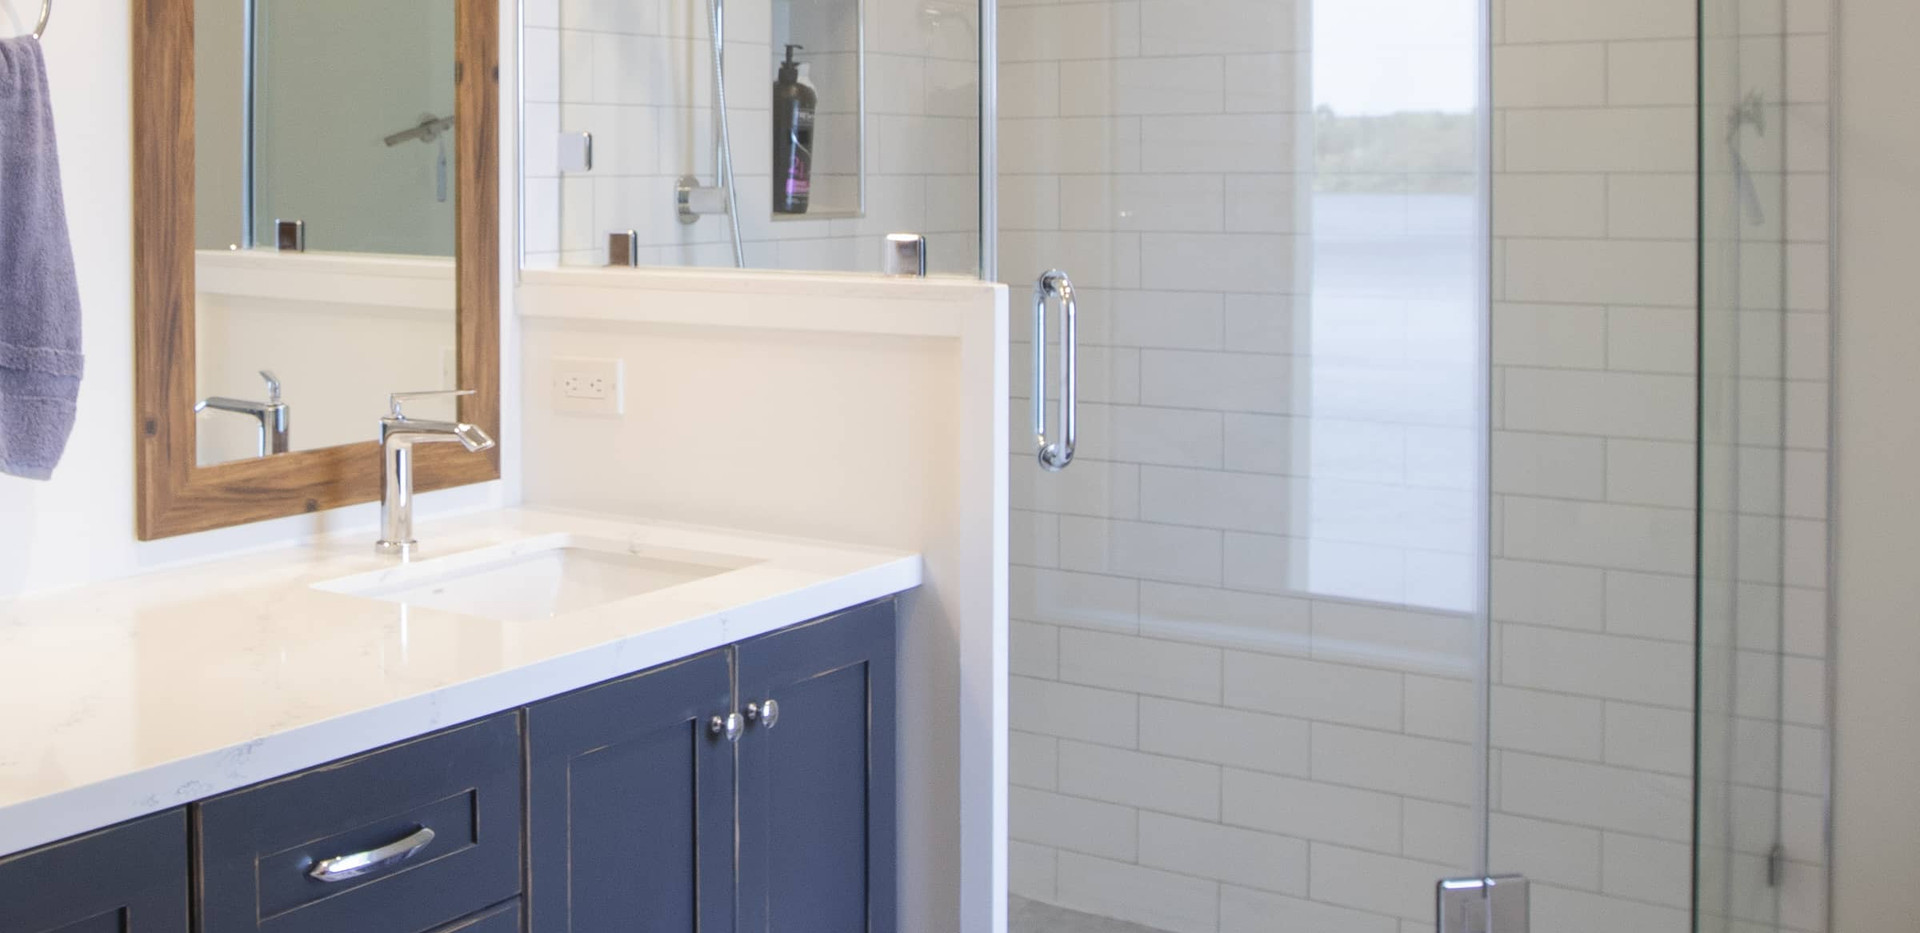 Contemporary Modern Bathroom with Blue Vanity